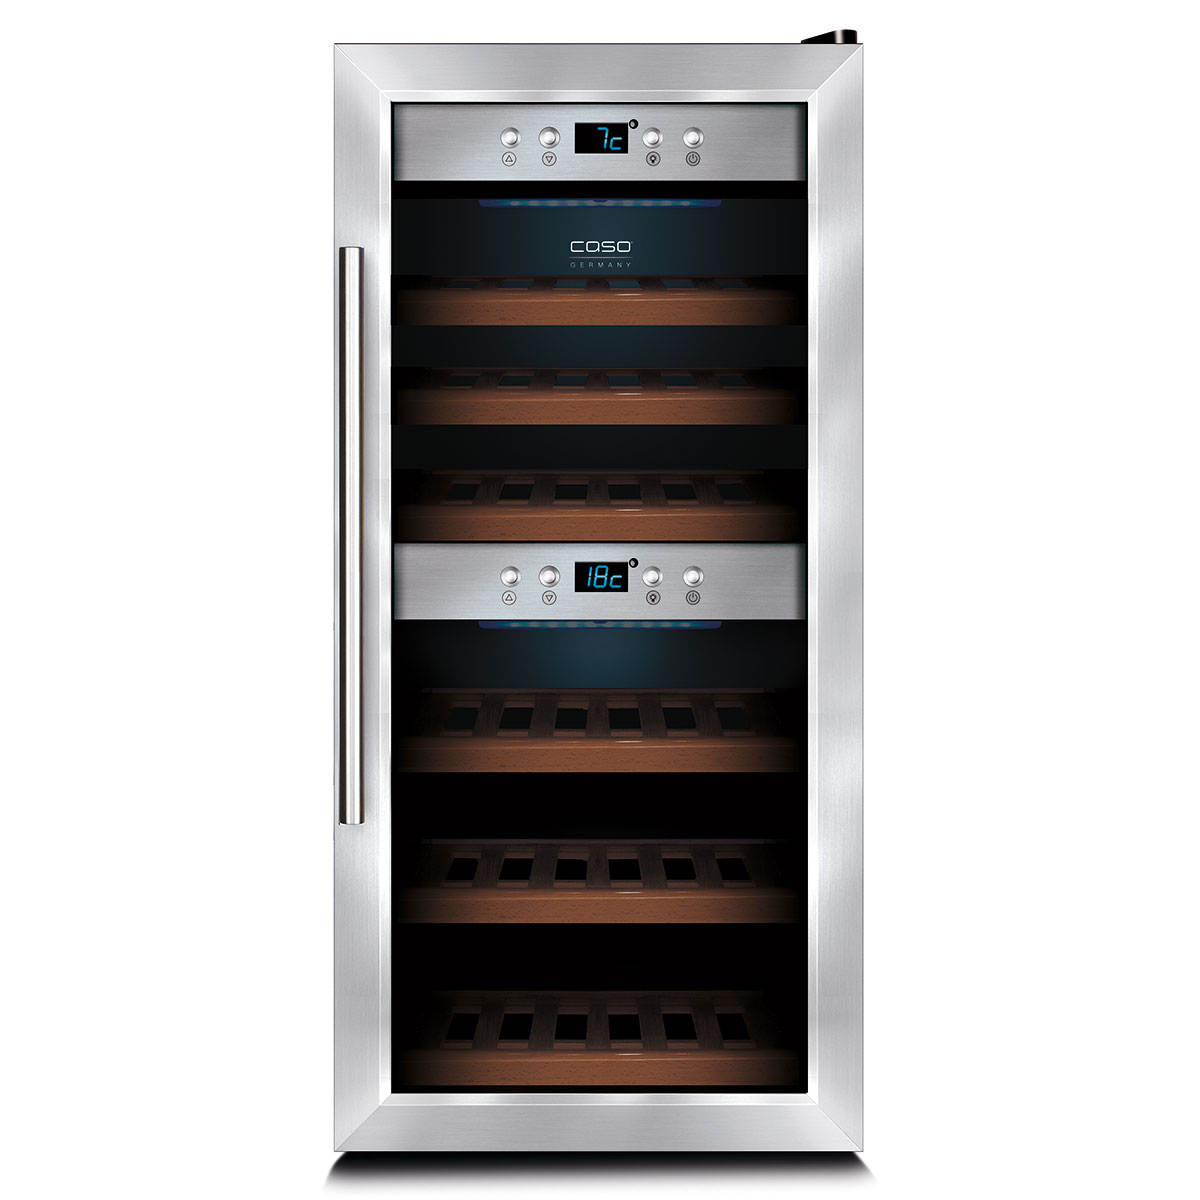 Caso vinkøleskab - WineMaster 24